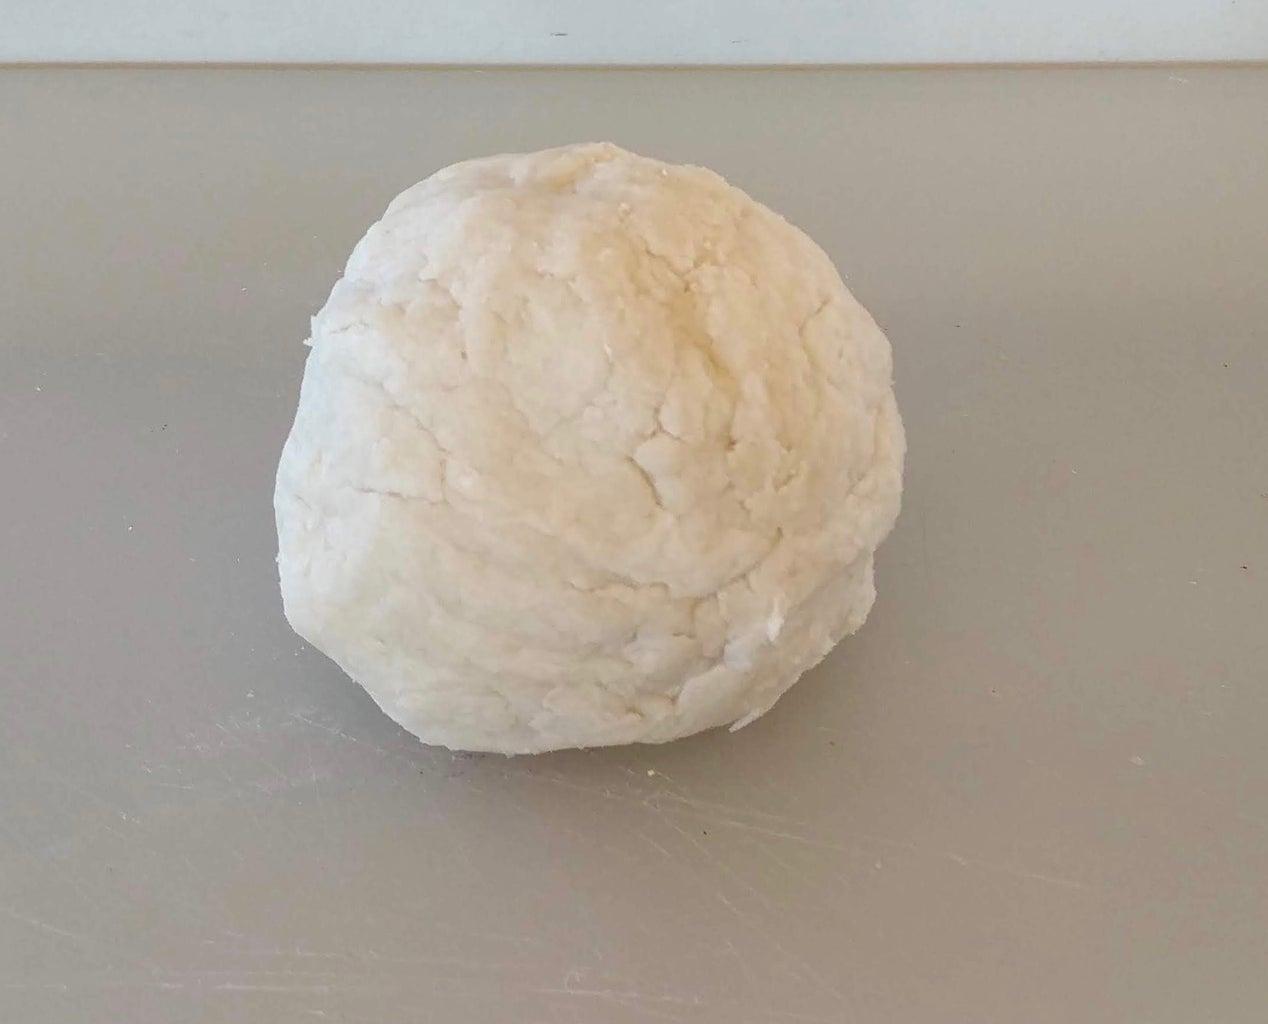 The Pie Dough